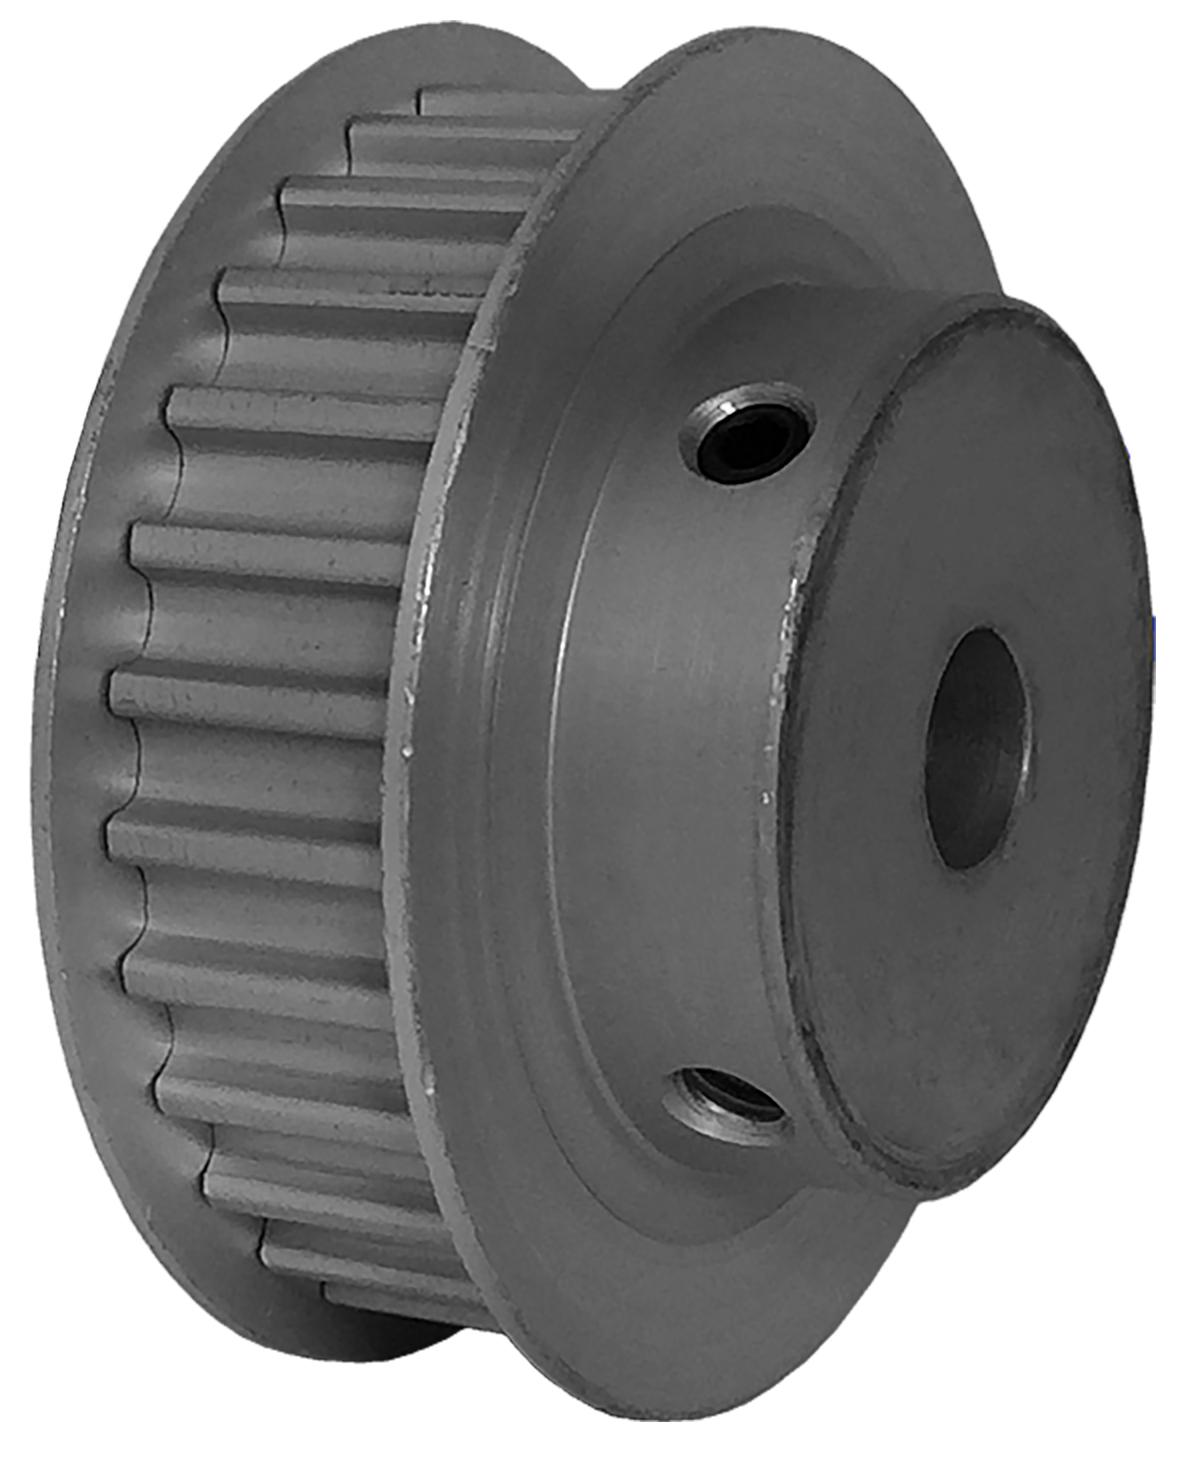 28-5M09M6FA8 - Aluminum Powerhouse®HTD® Pulleys